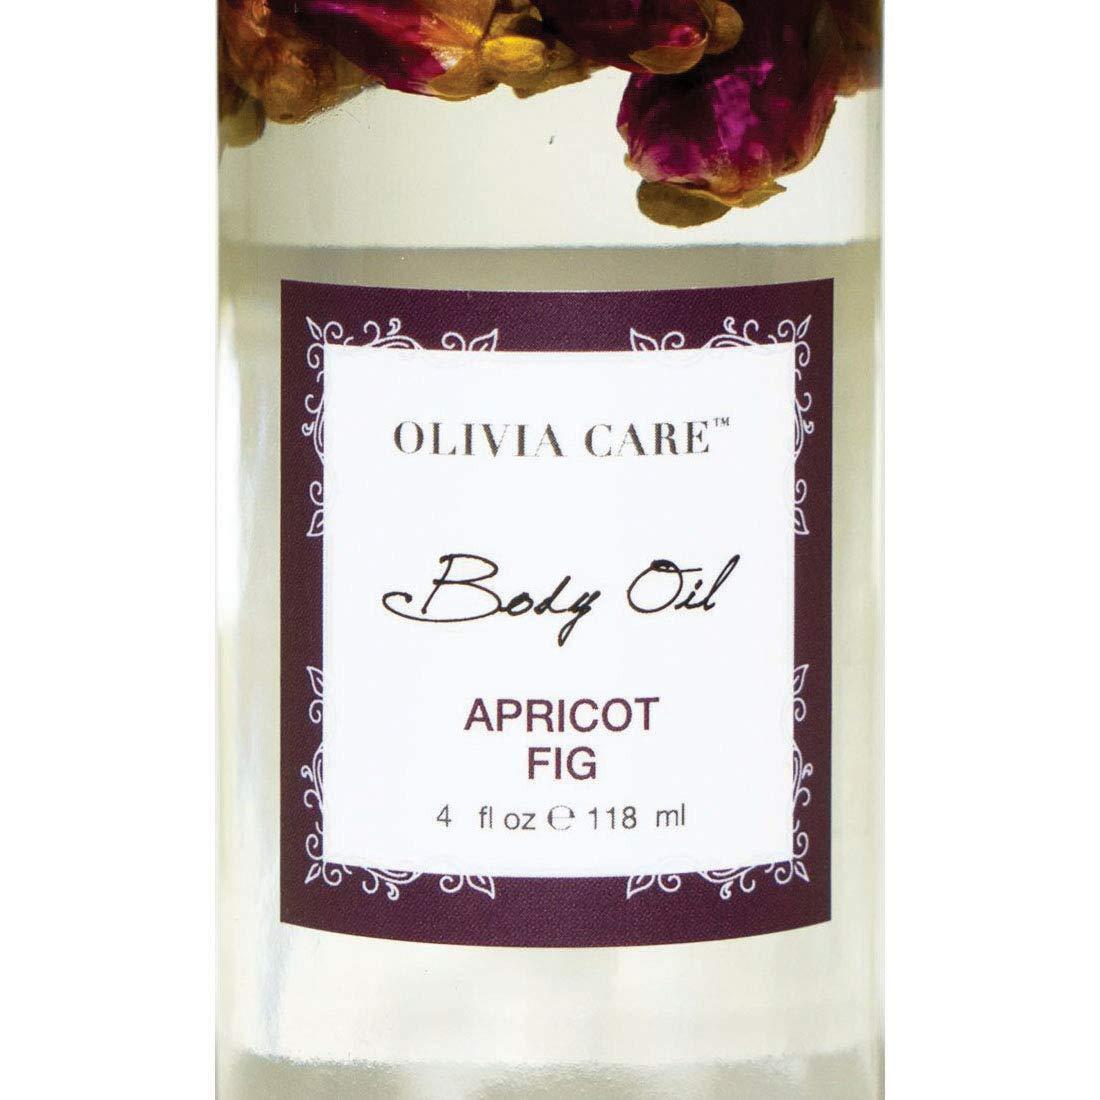 OLIVIA CARE Body Oils, Flavors: Apricot Fig, French Rose, Jasmine Gardenia -All Natural Perfume Fragrance & Body Oil Moisturizer, Rich in Vitamin E, K, Omega fatty Acids (Apricot Fig)